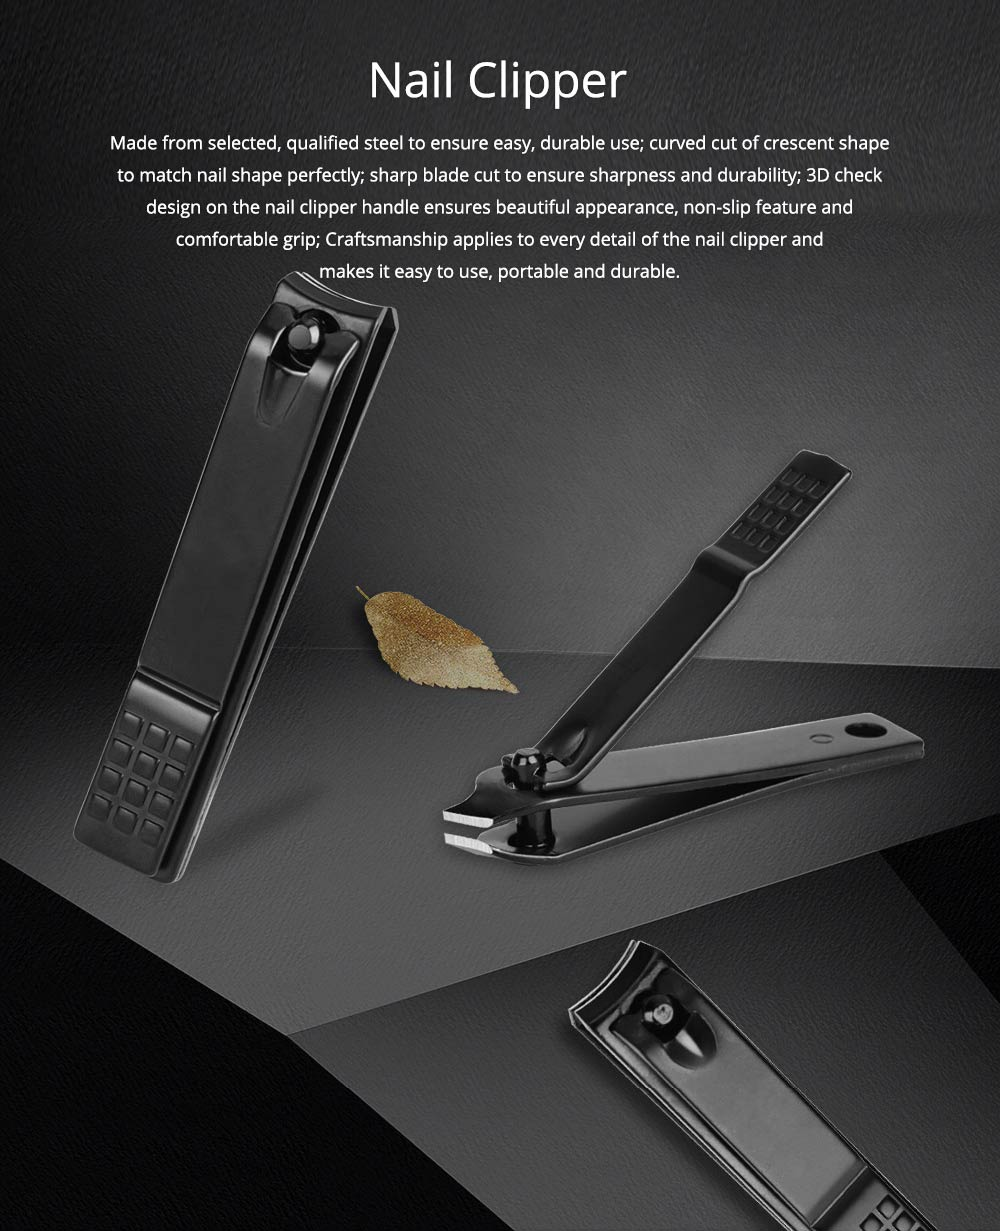 Carbon Steel Nail Clipper Black Treatment Nail Caring Tool Carton Steel Clipper EXW Nail Caring Nail Clipper 0